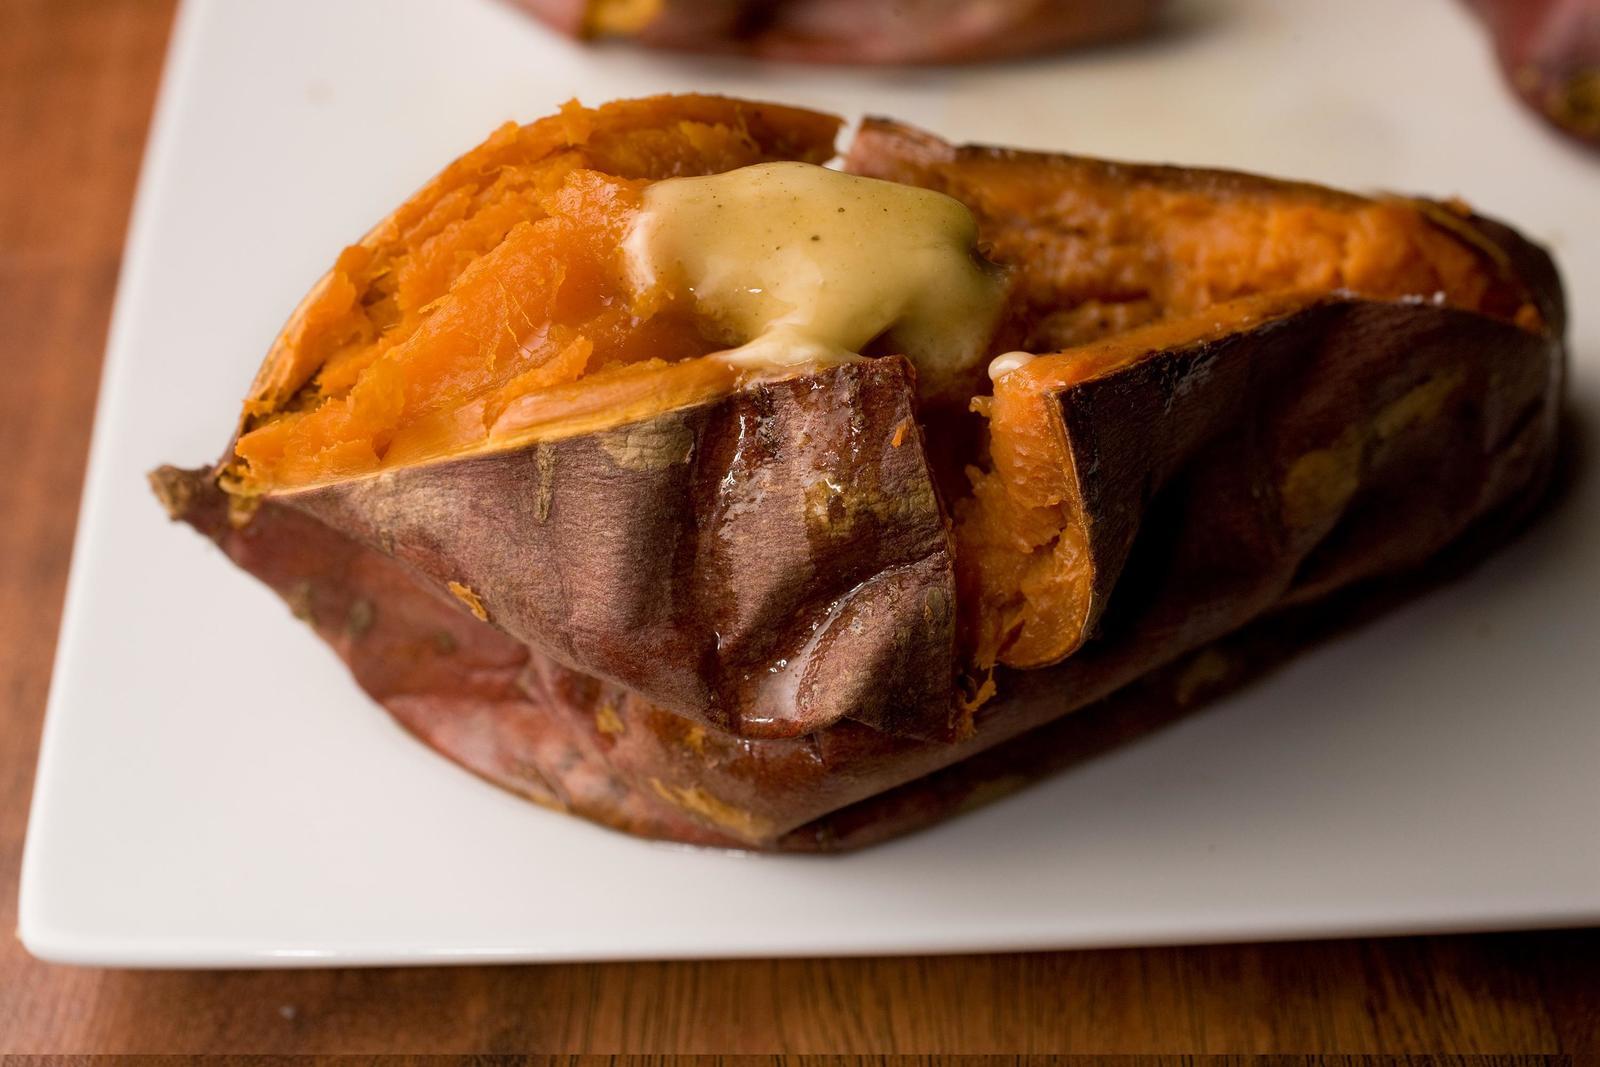 Baked Sweet Potato Recipes  Baked Sweet Potato Recipe Chowhound